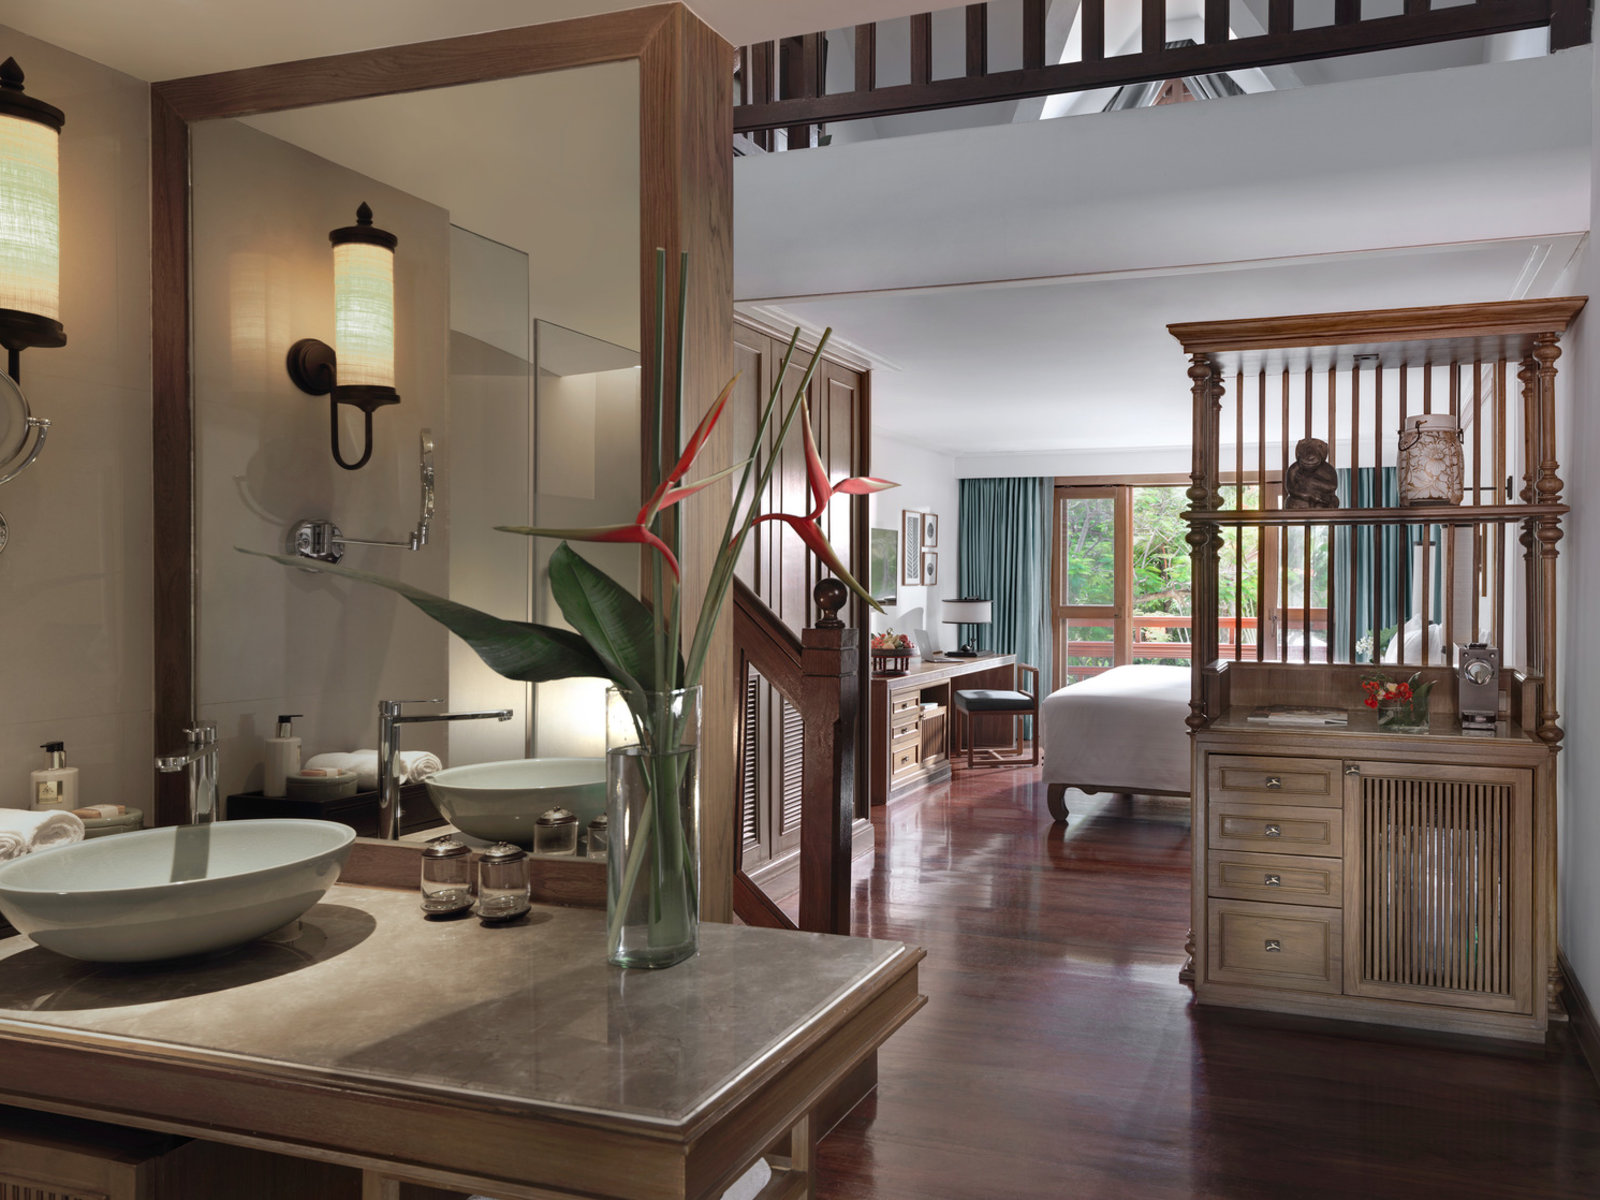 Wohnbeispiel One Bedroom Duplex Suite